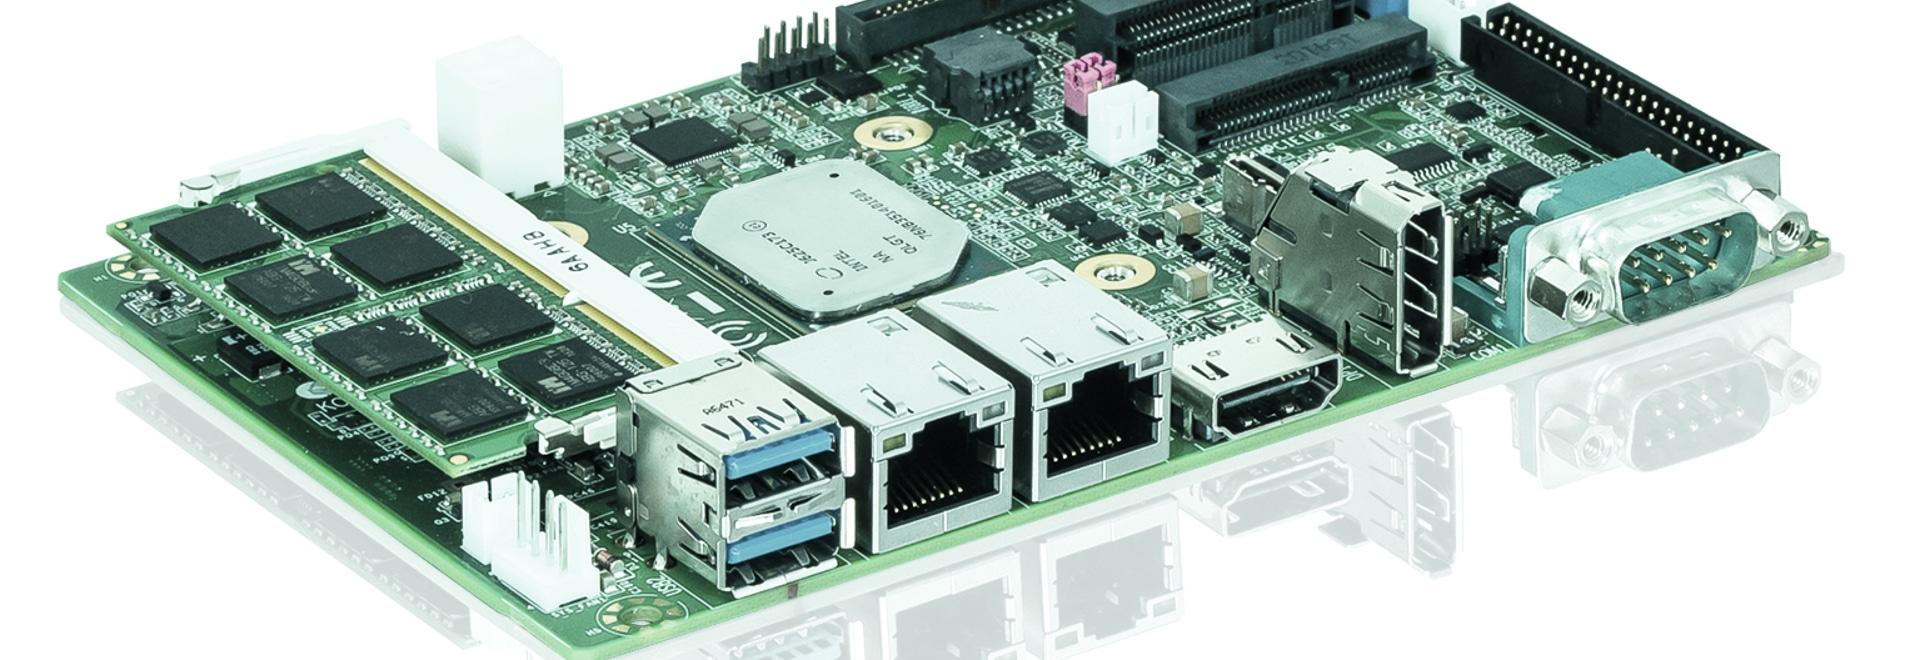 "New Kontron 3.5"" Single Board Computers"